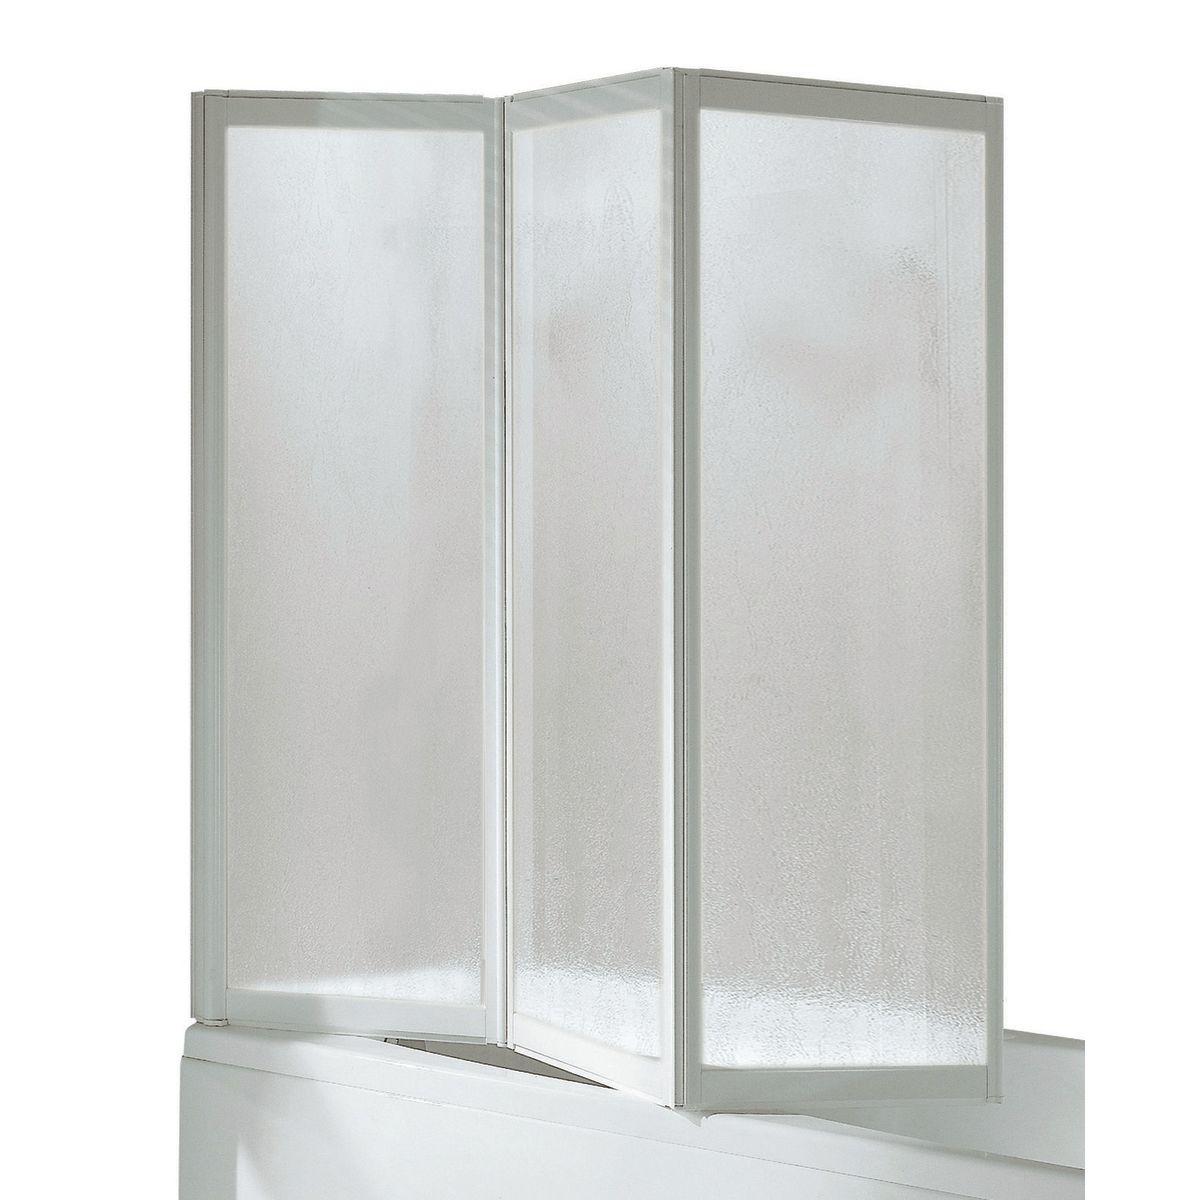 porte in vetro leroy merlin porte per interni with porte. Black Bedroom Furniture Sets. Home Design Ideas